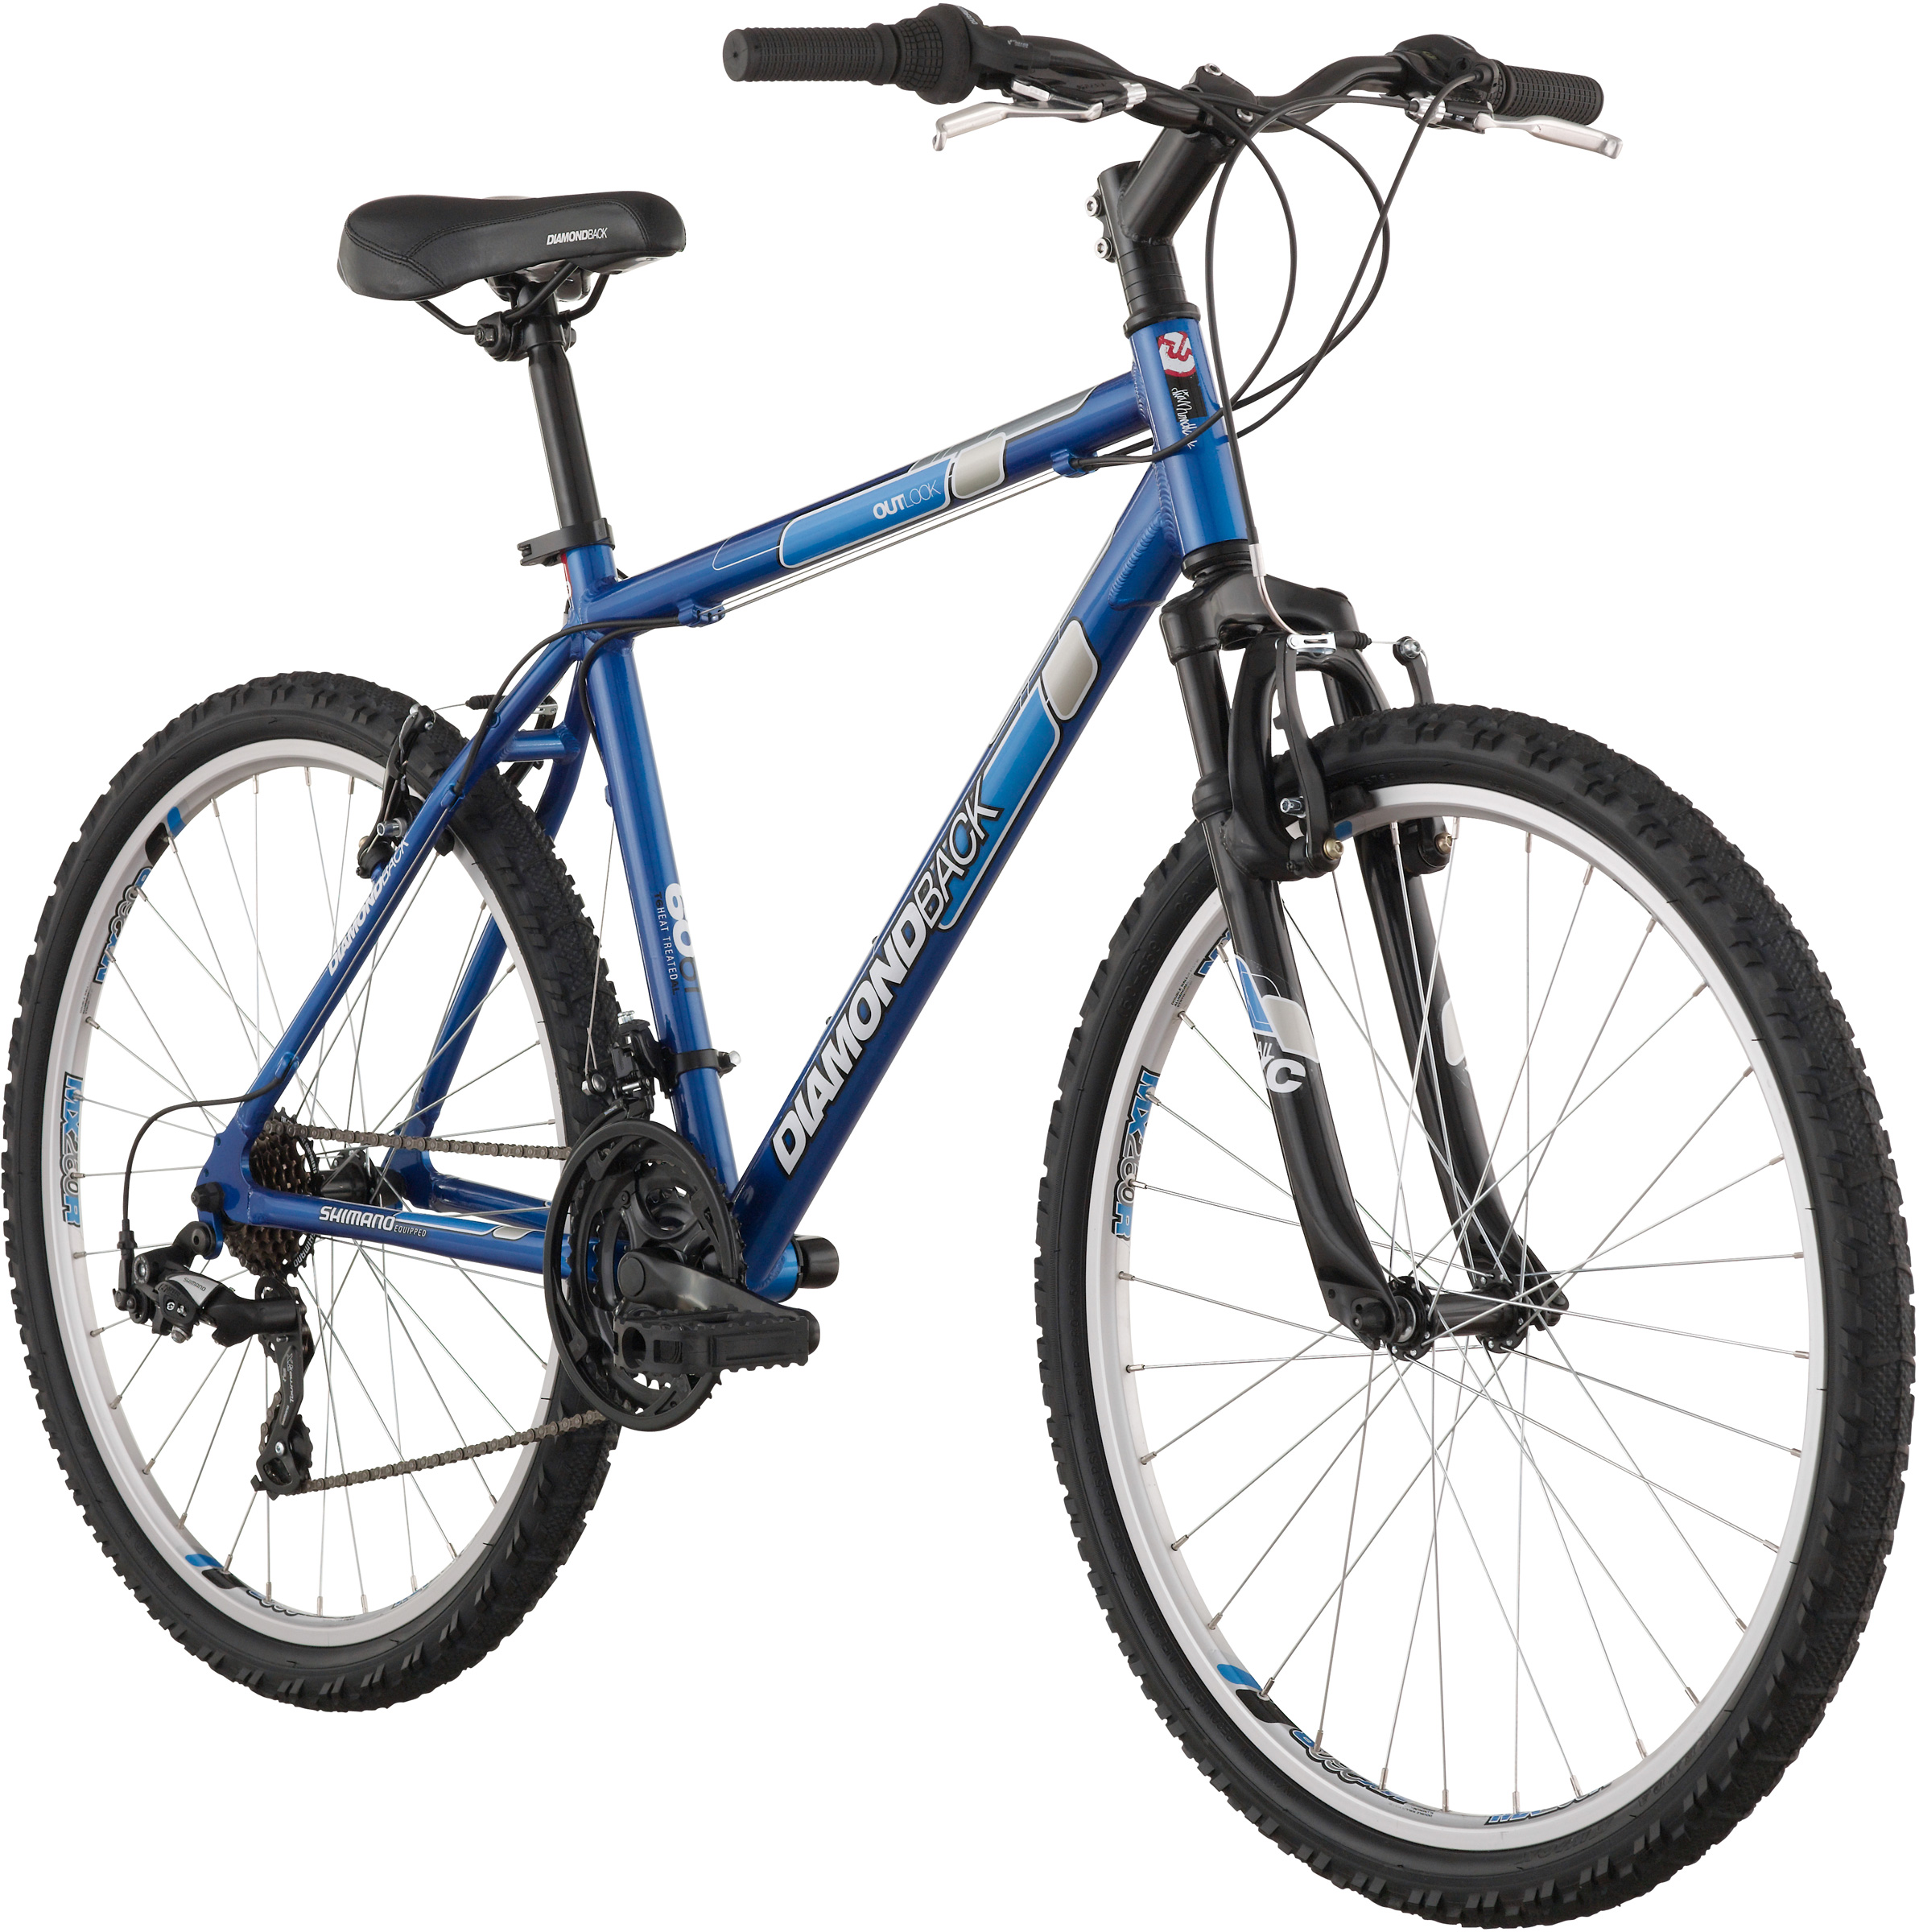 Diamondback Outlook - Bert's Bikes & Fitness